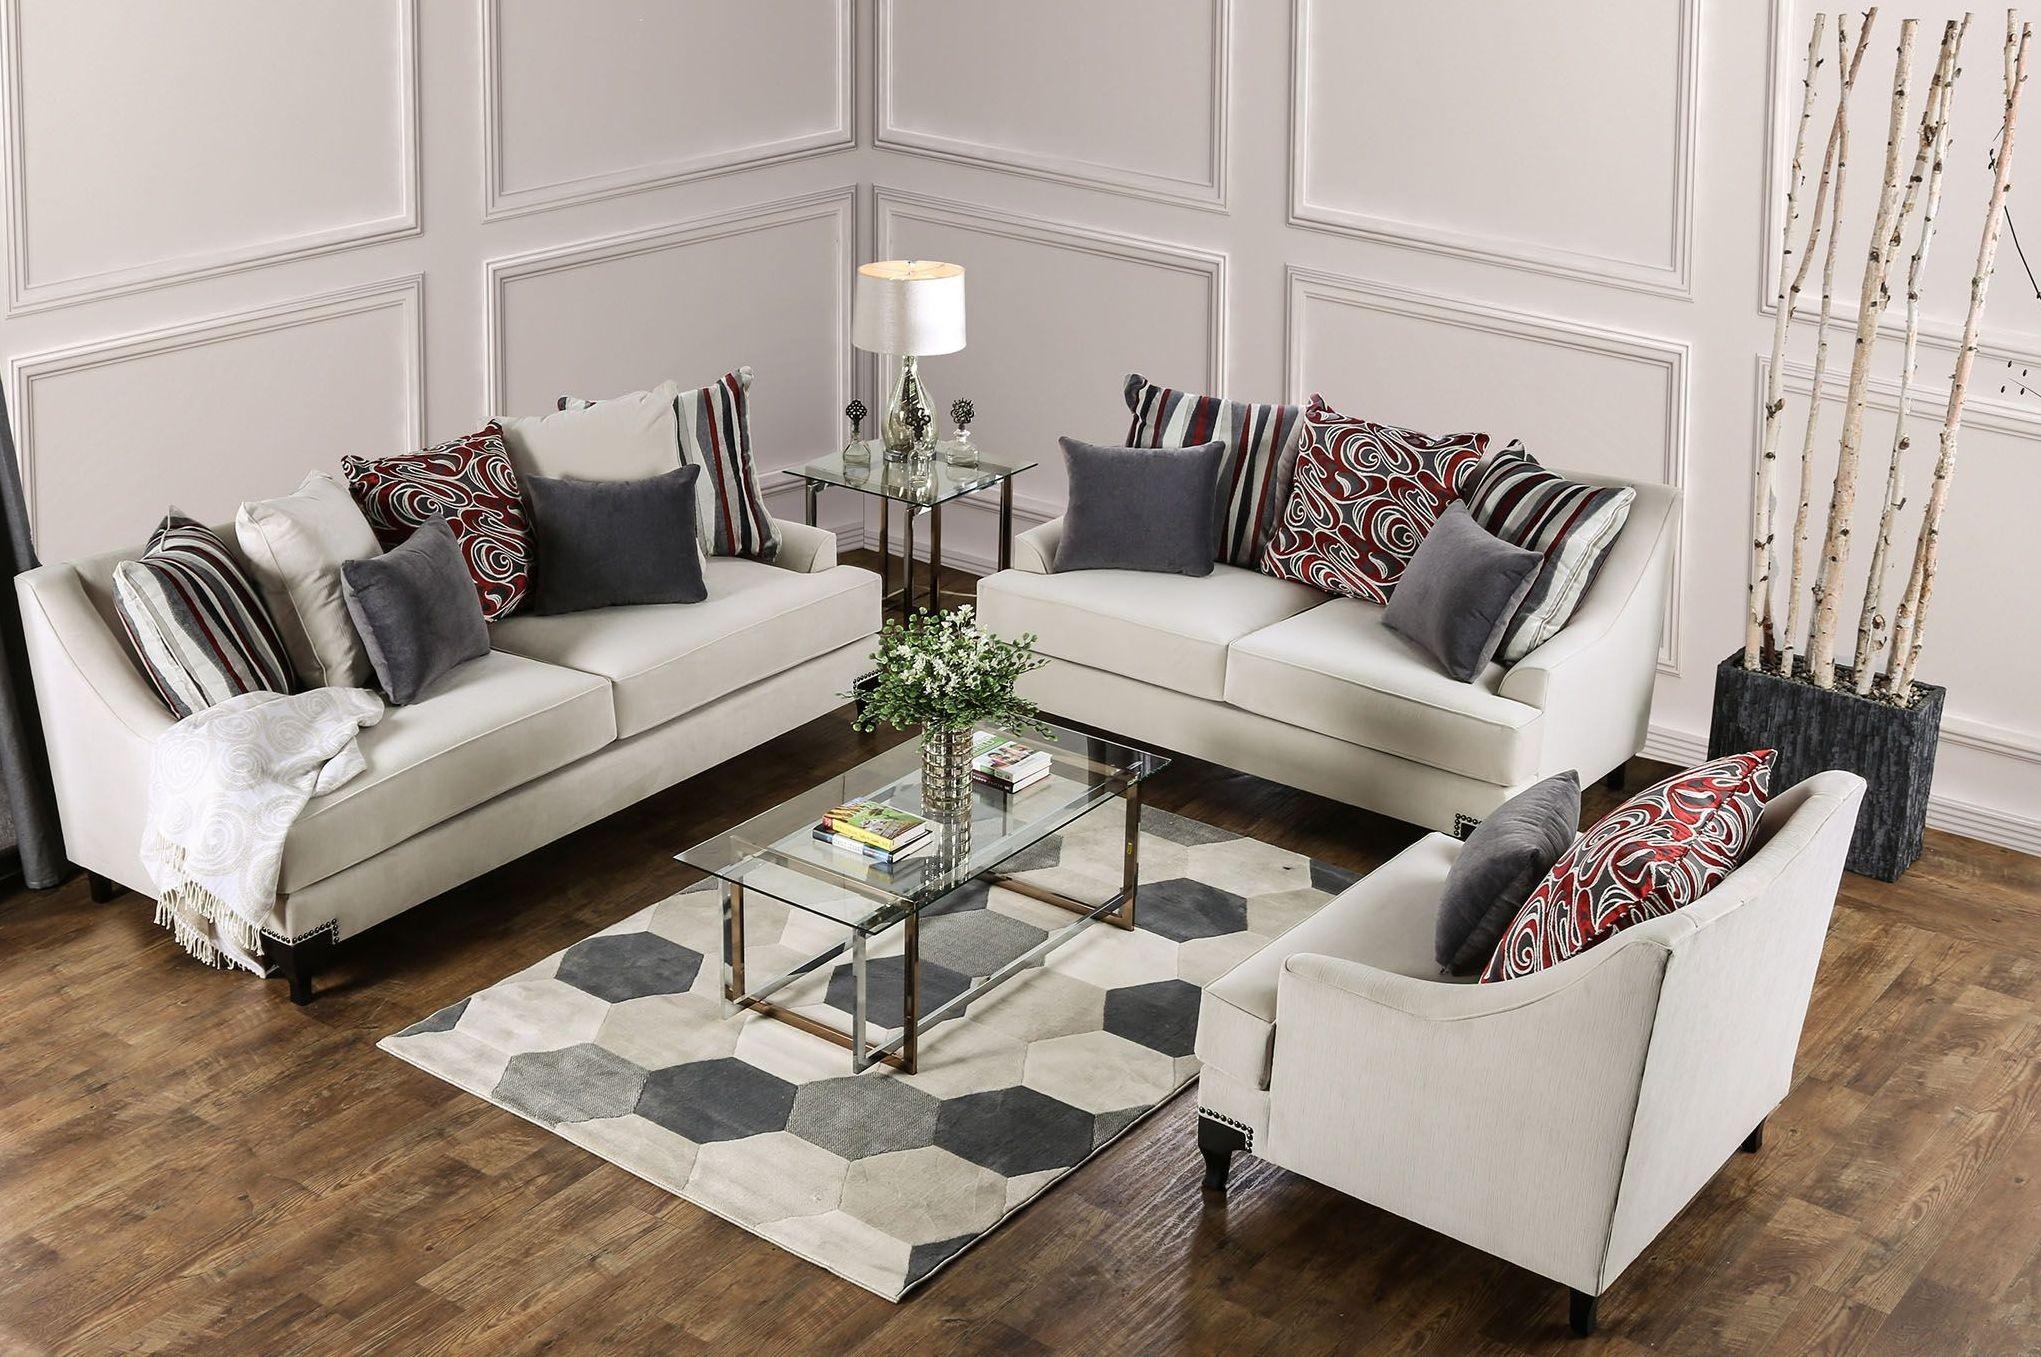 Viscontti Ivory Upholstered Living Room Set Sm2206 Sf Furniture Of America